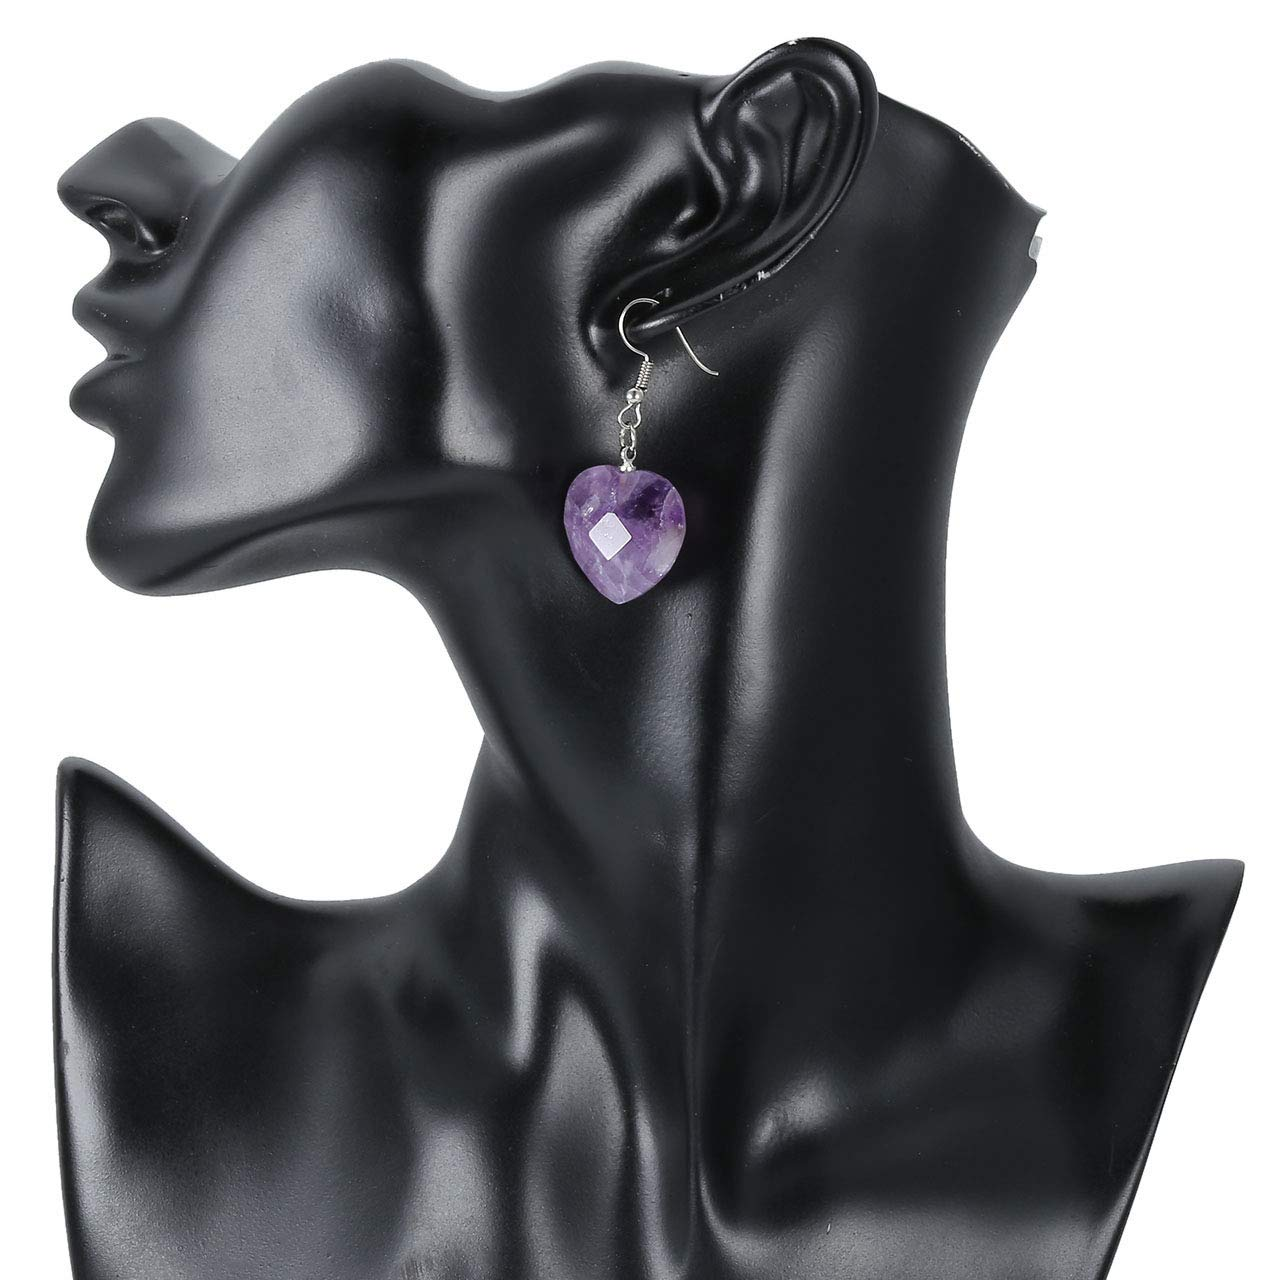 PESOENTH Natural Amethyst//Rose Quaurtz//Tiger Eye Gemstone Crystal Healing Reiki Heart Charm Dangle Drop Earrings Boho Jewellery for Women Girl Christmas Gifts